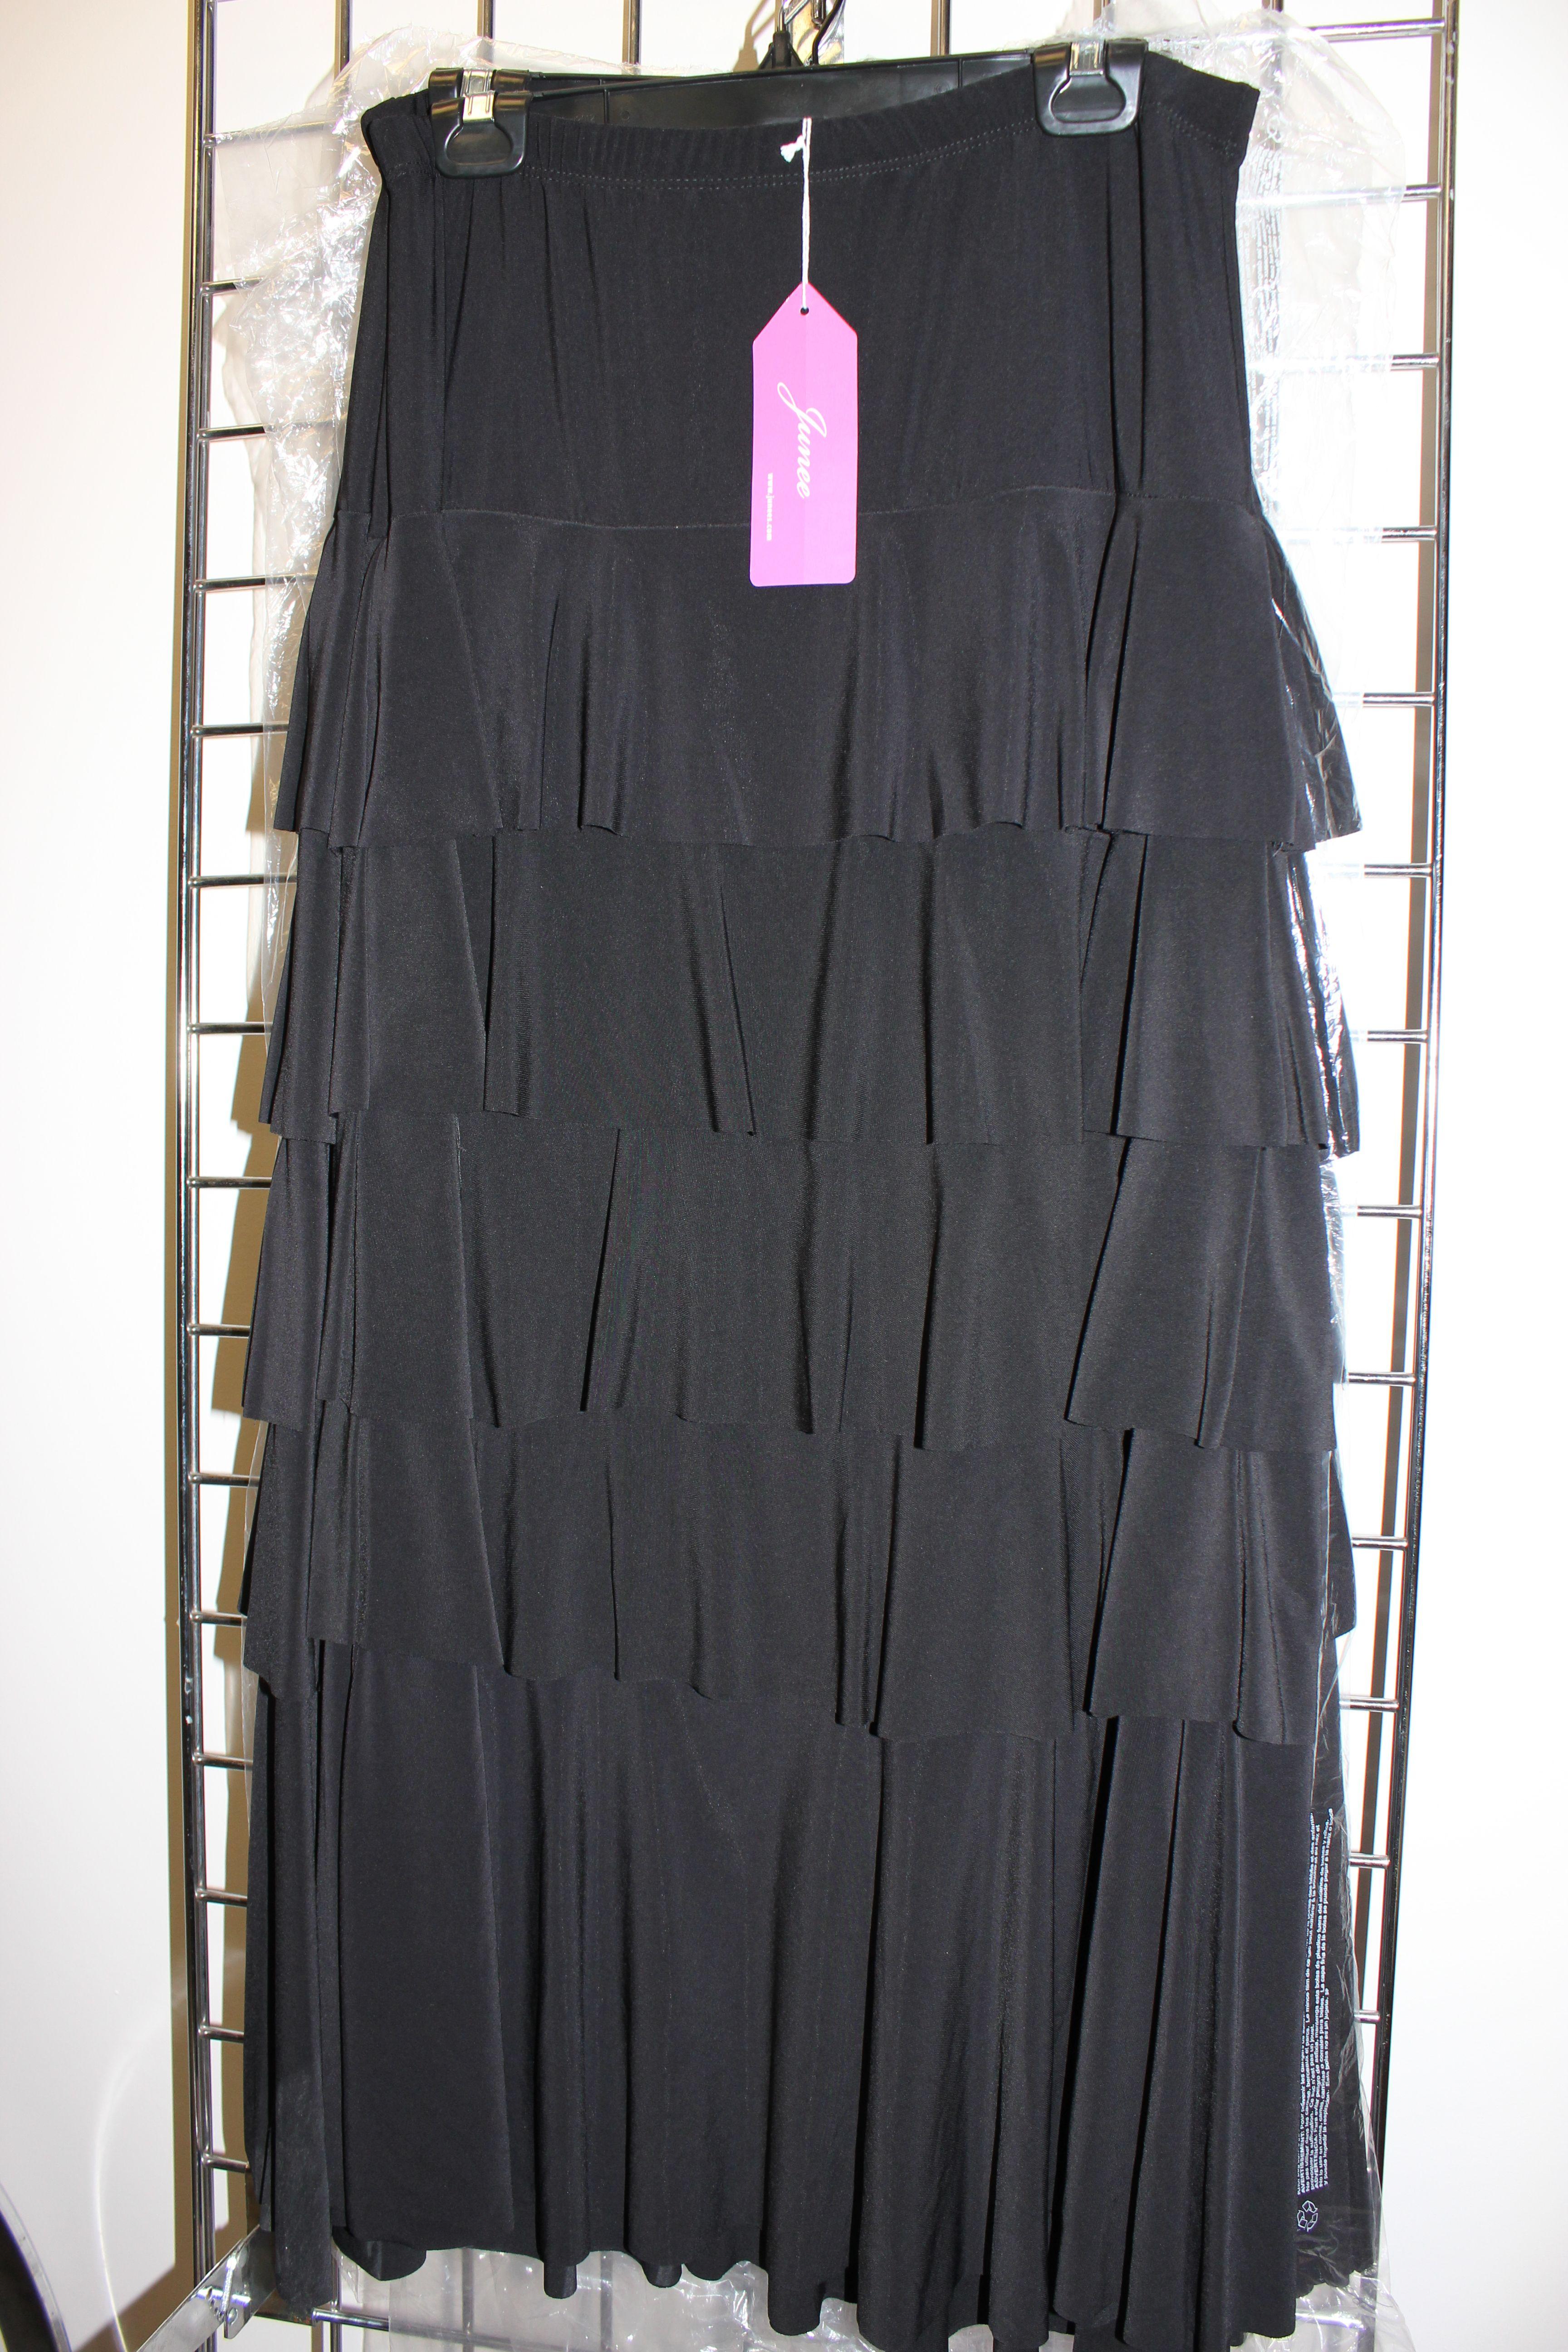 ITY fabric long ruffle skirt | Apostolic Clothing | Pinterest